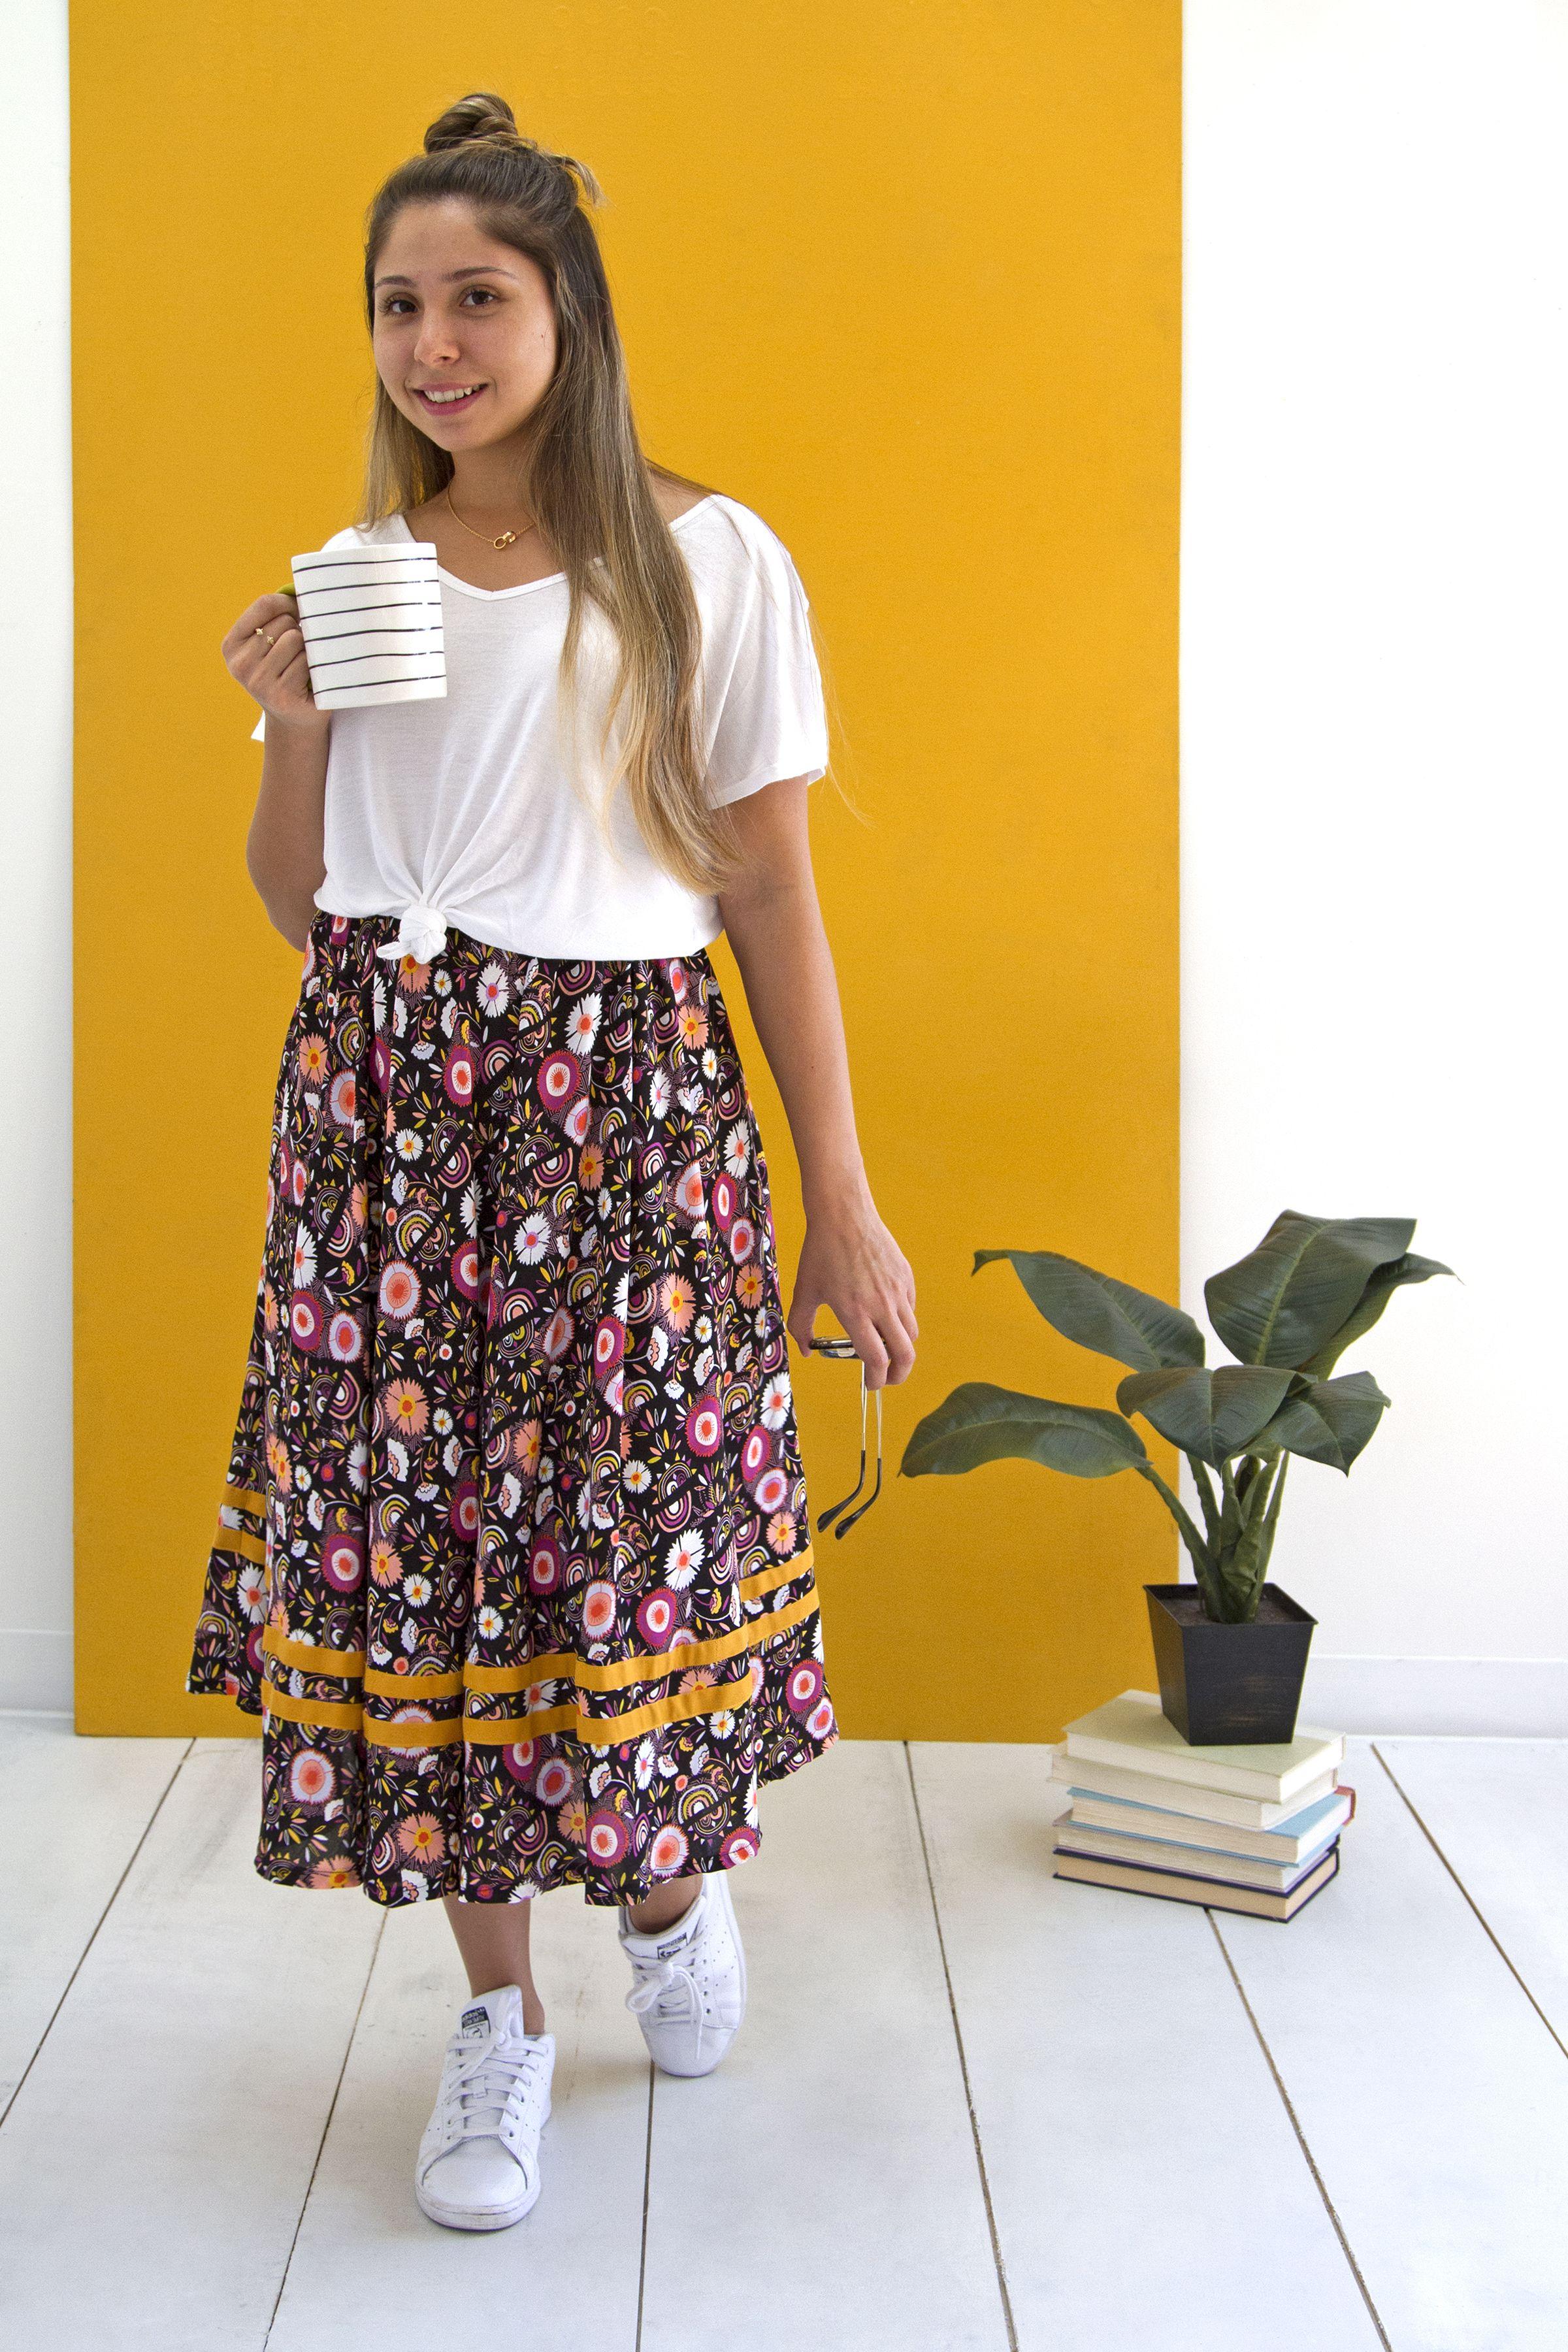 Kushukuru Fabric Lookbook Project Catalog